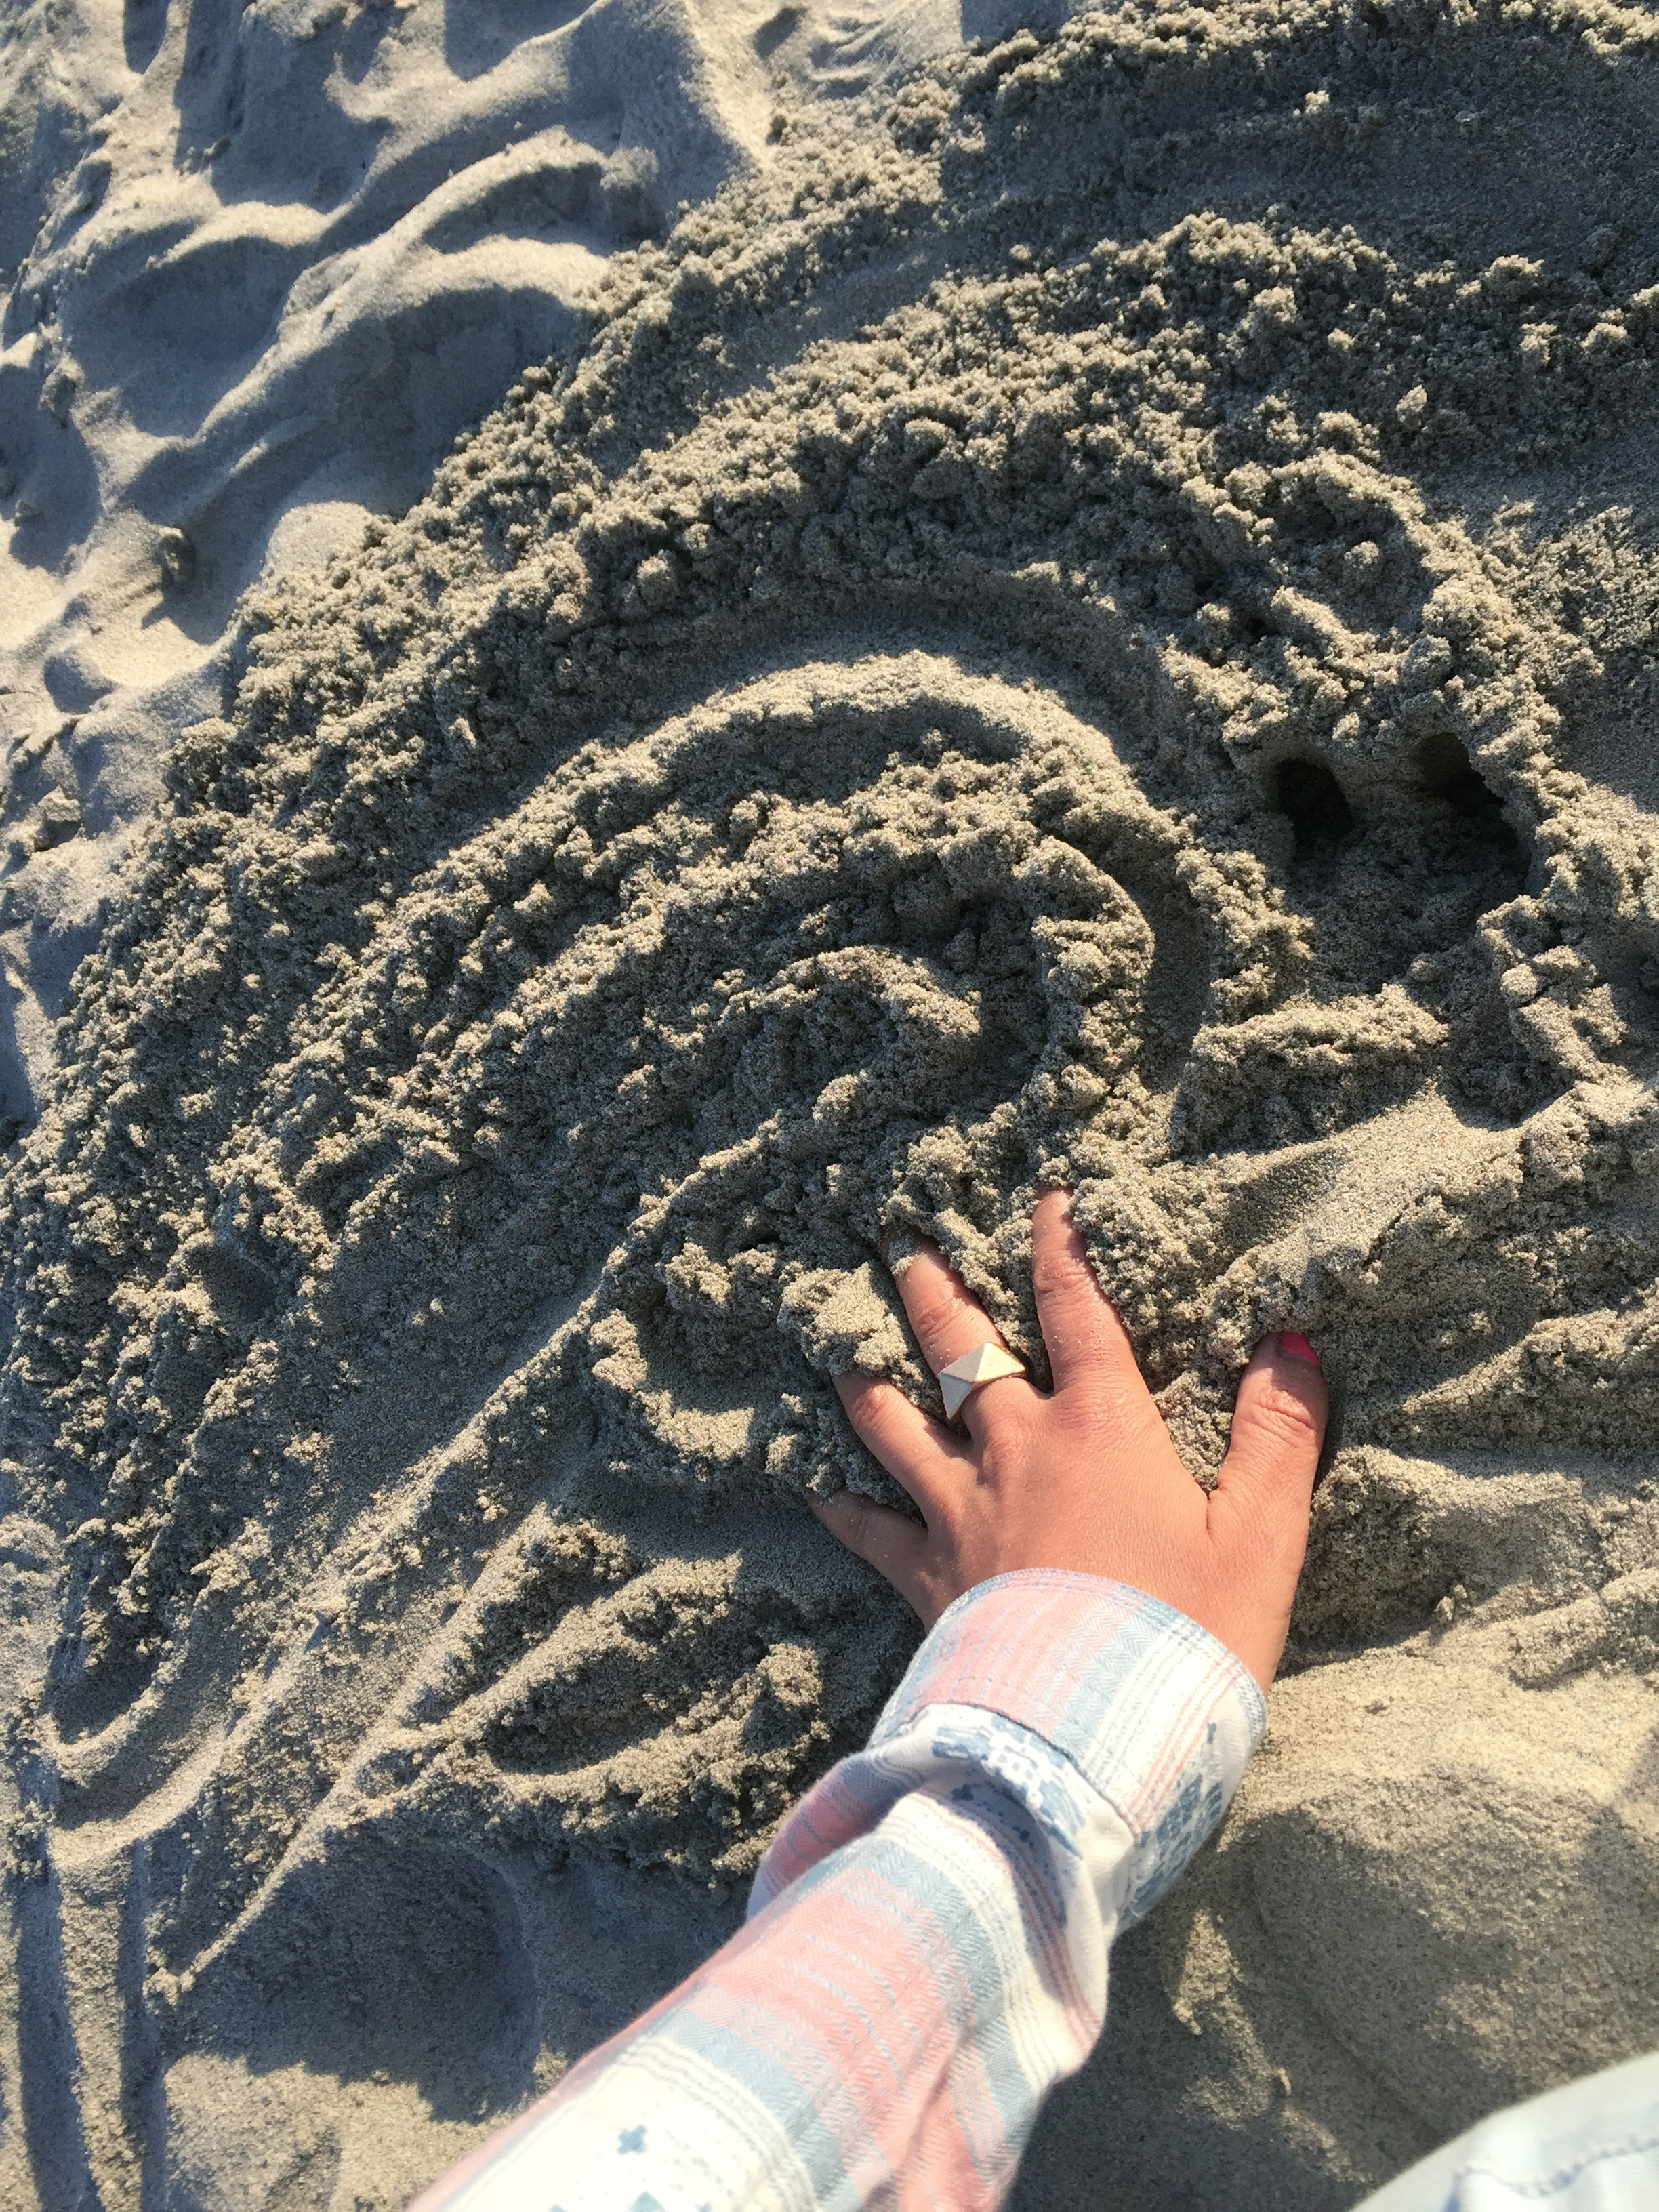 carlsbad-california-beach.jpg